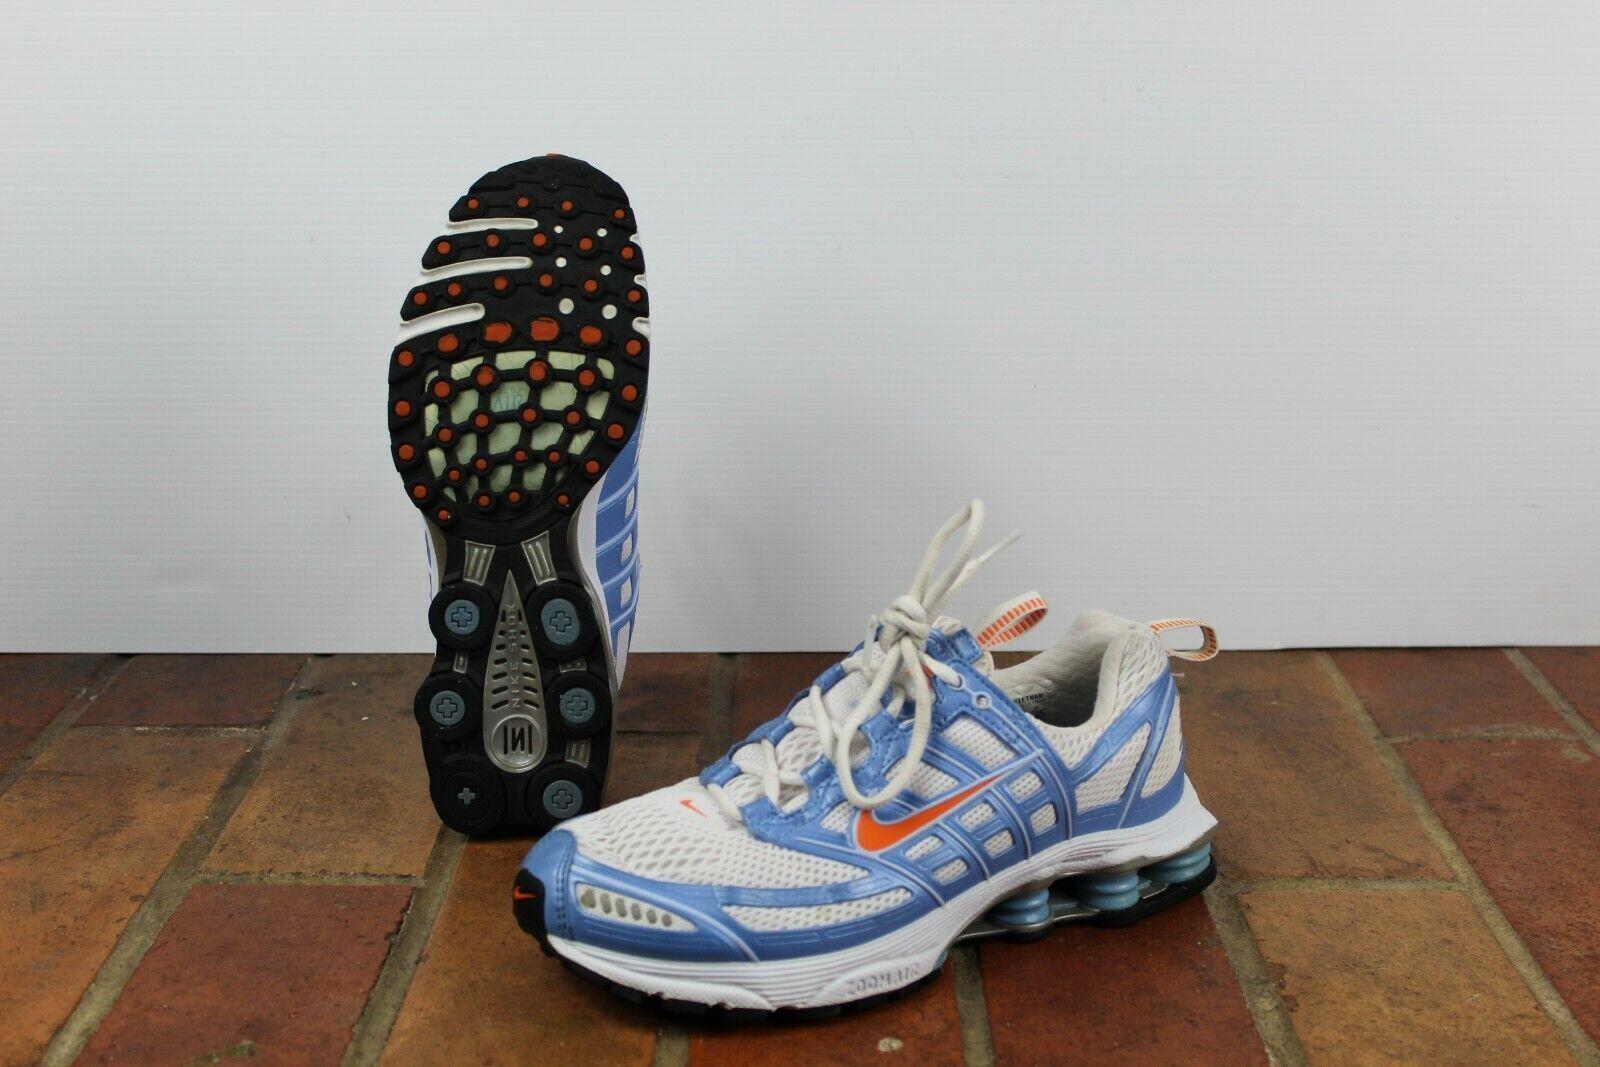 Nike Huarache Run PRM Particle beige desert sand 634835 202 Womens Running Shoes 634835 202